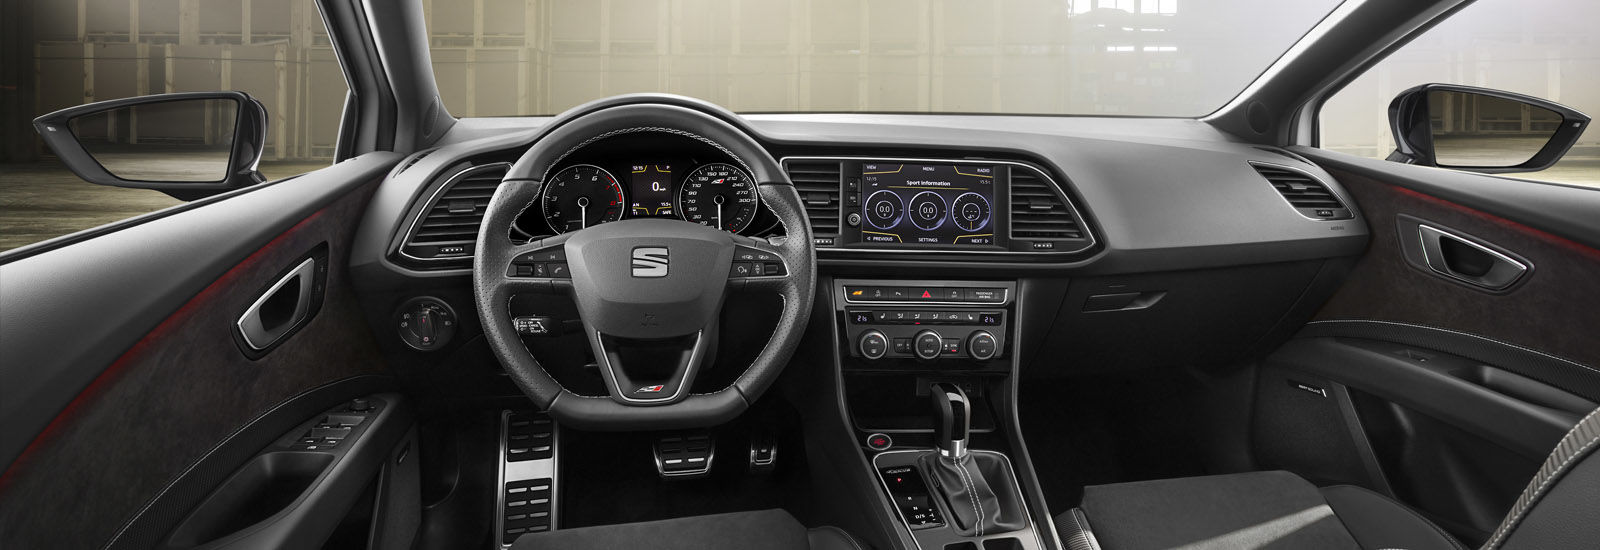 2017 Seat Leon Cupra R Price Specs Release Date Carwow